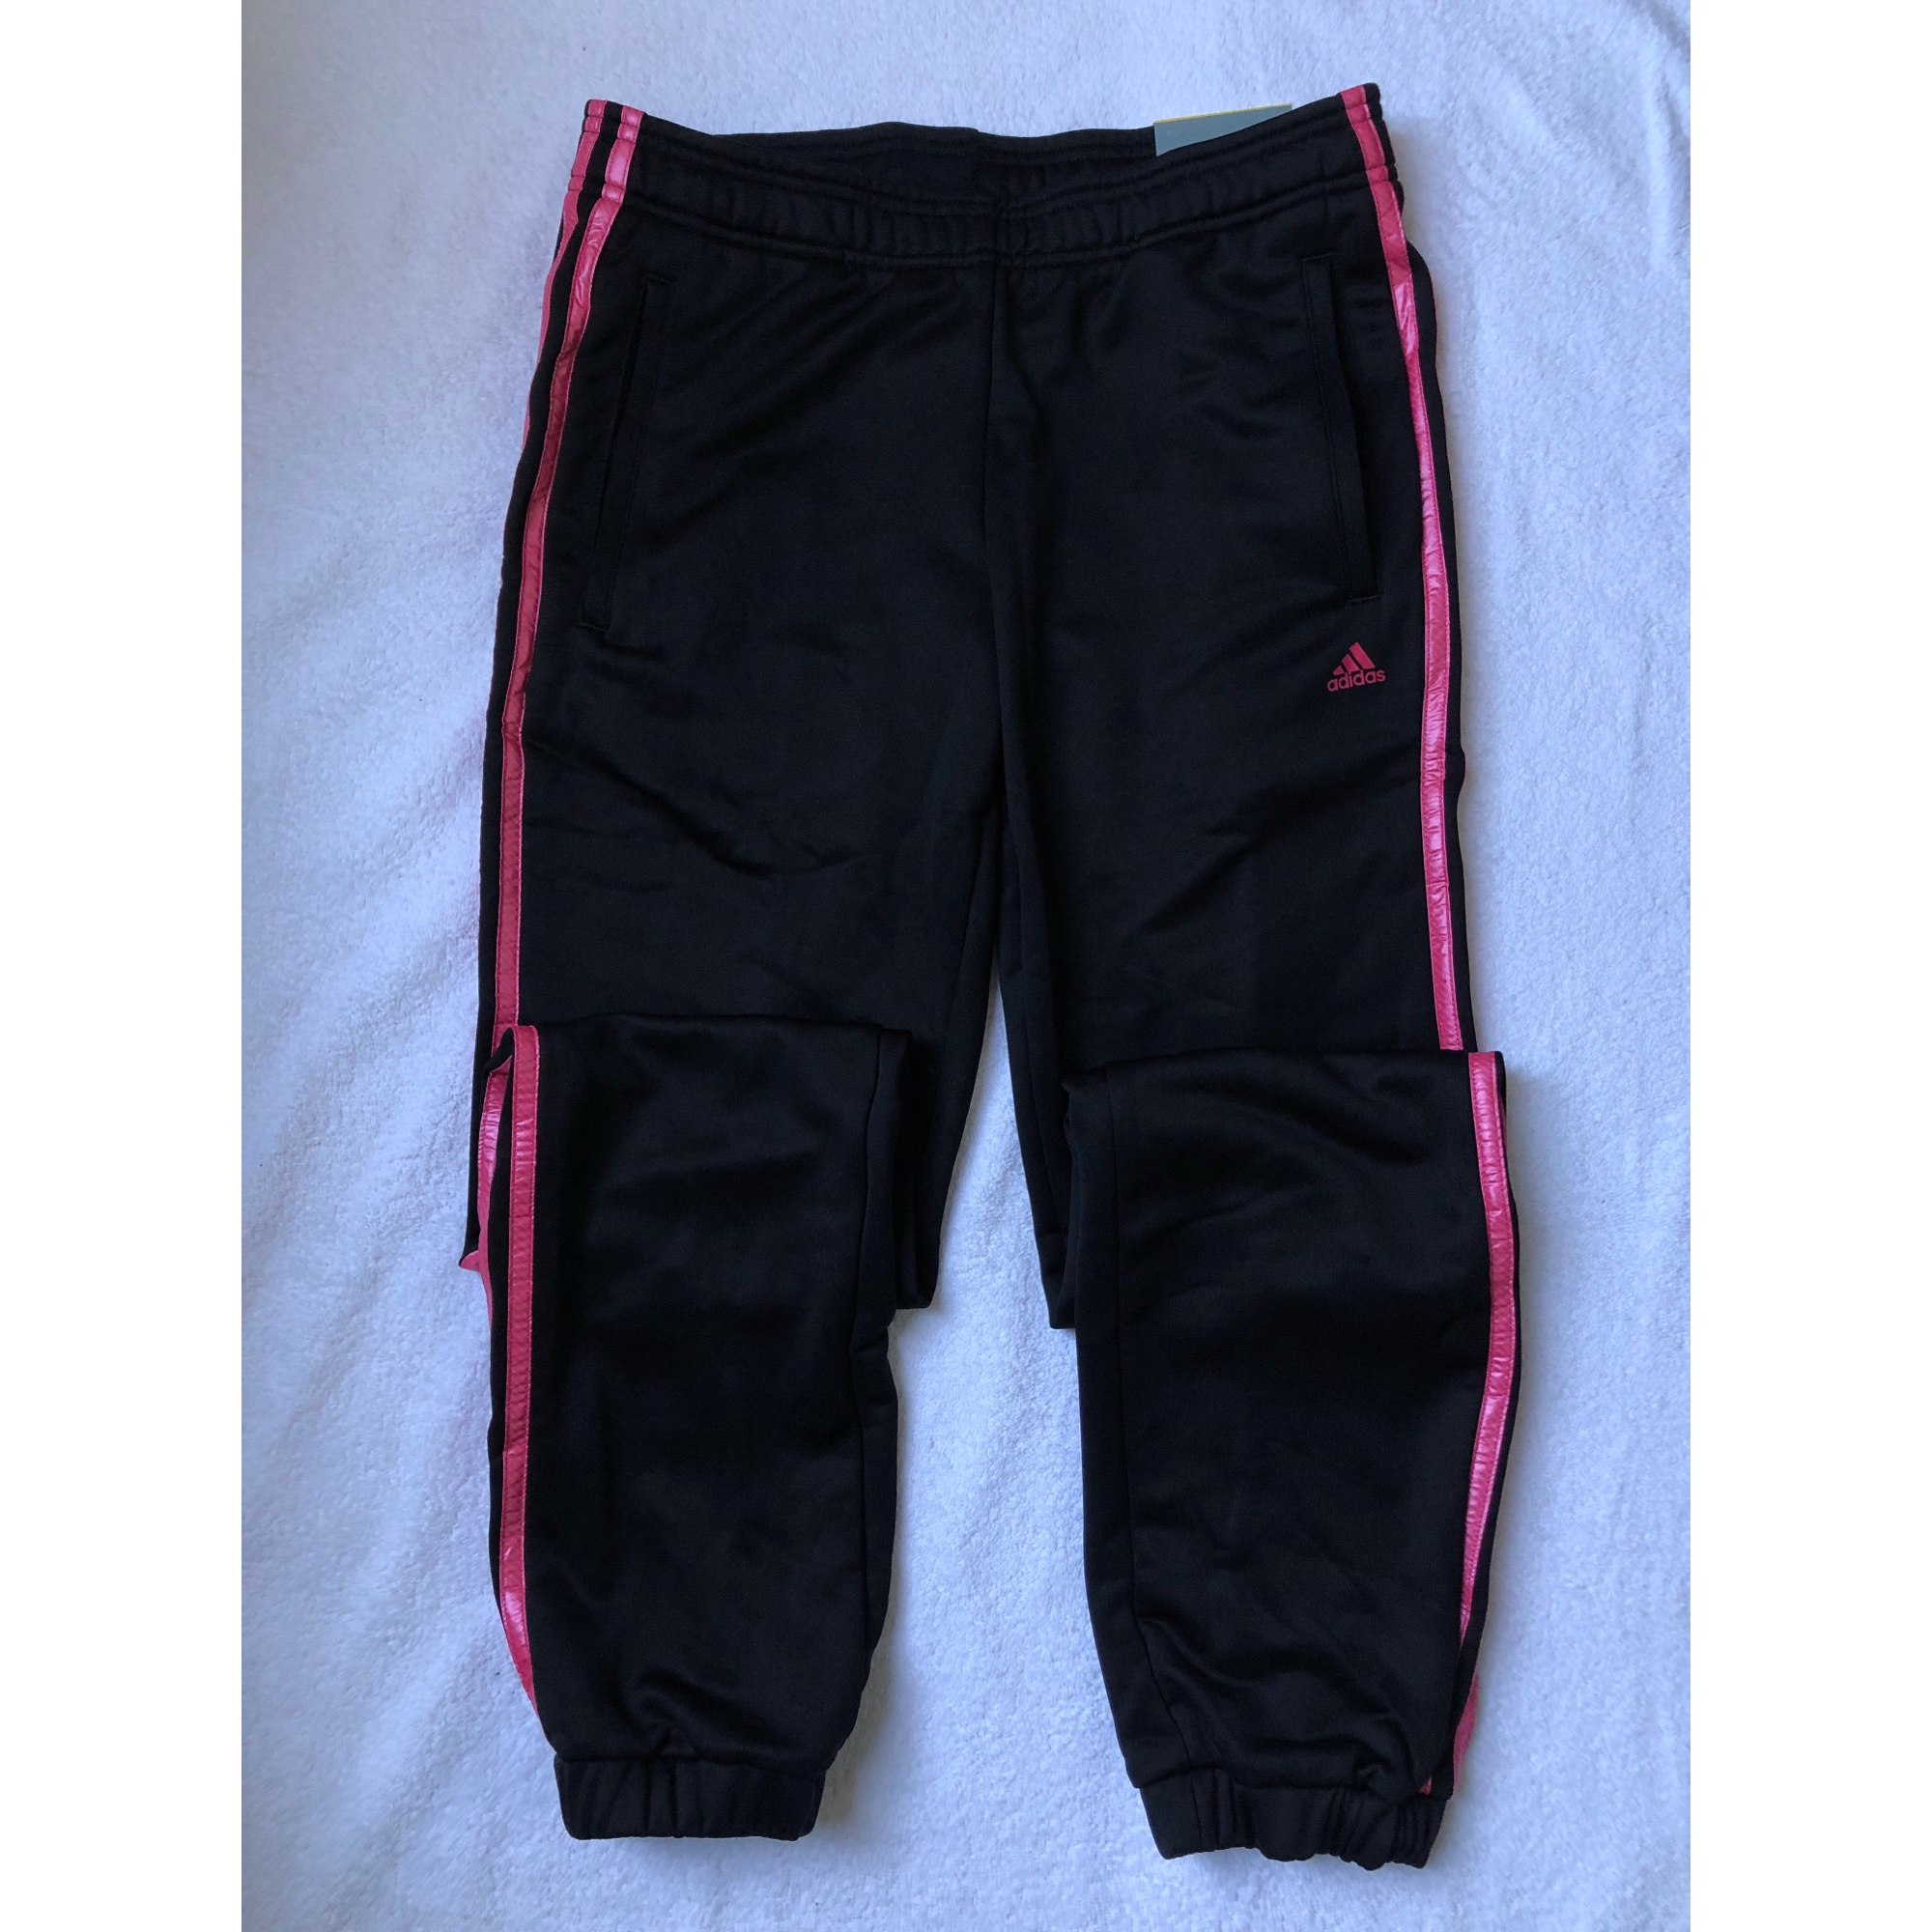 Survetement Adidas Noir 7